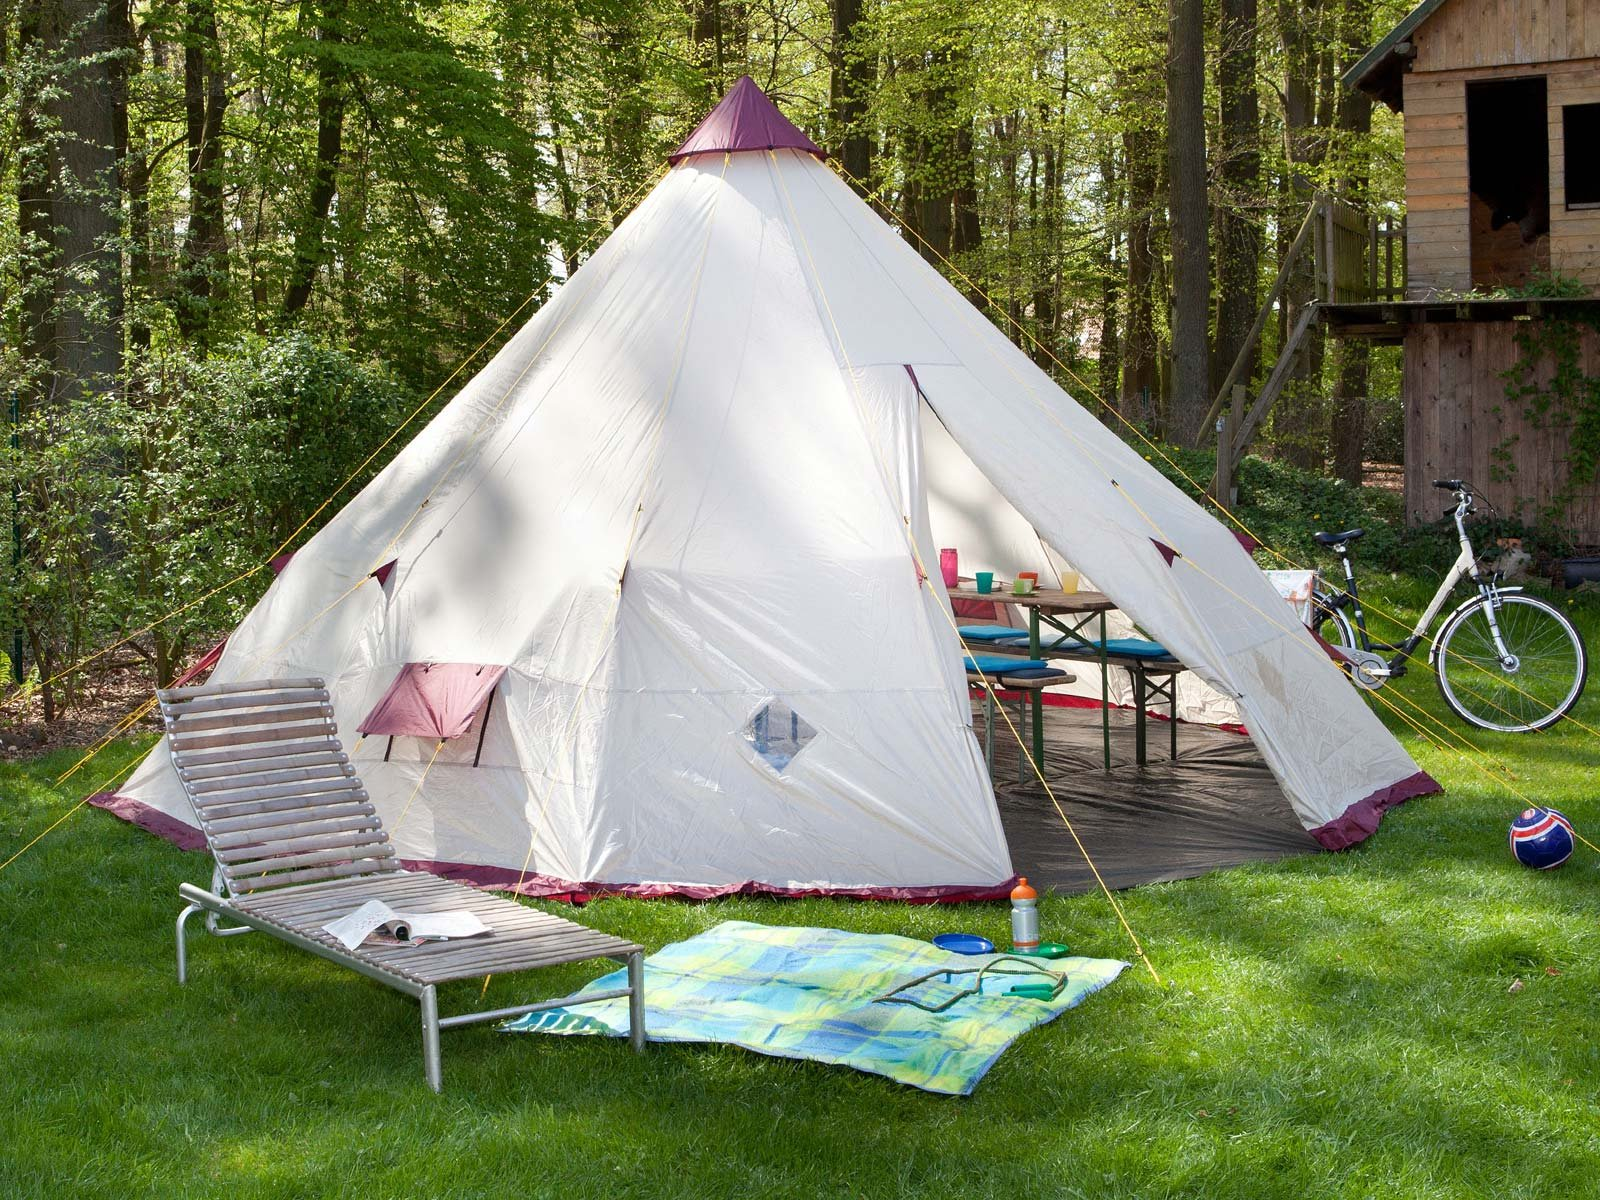 finest selection 9c905 65103 Skandika Teepee Wigwam Style Indiana Pyramid Desert Tent, 3000 Mm Water  Column, Beige/Burgundy - Top Teepee UK